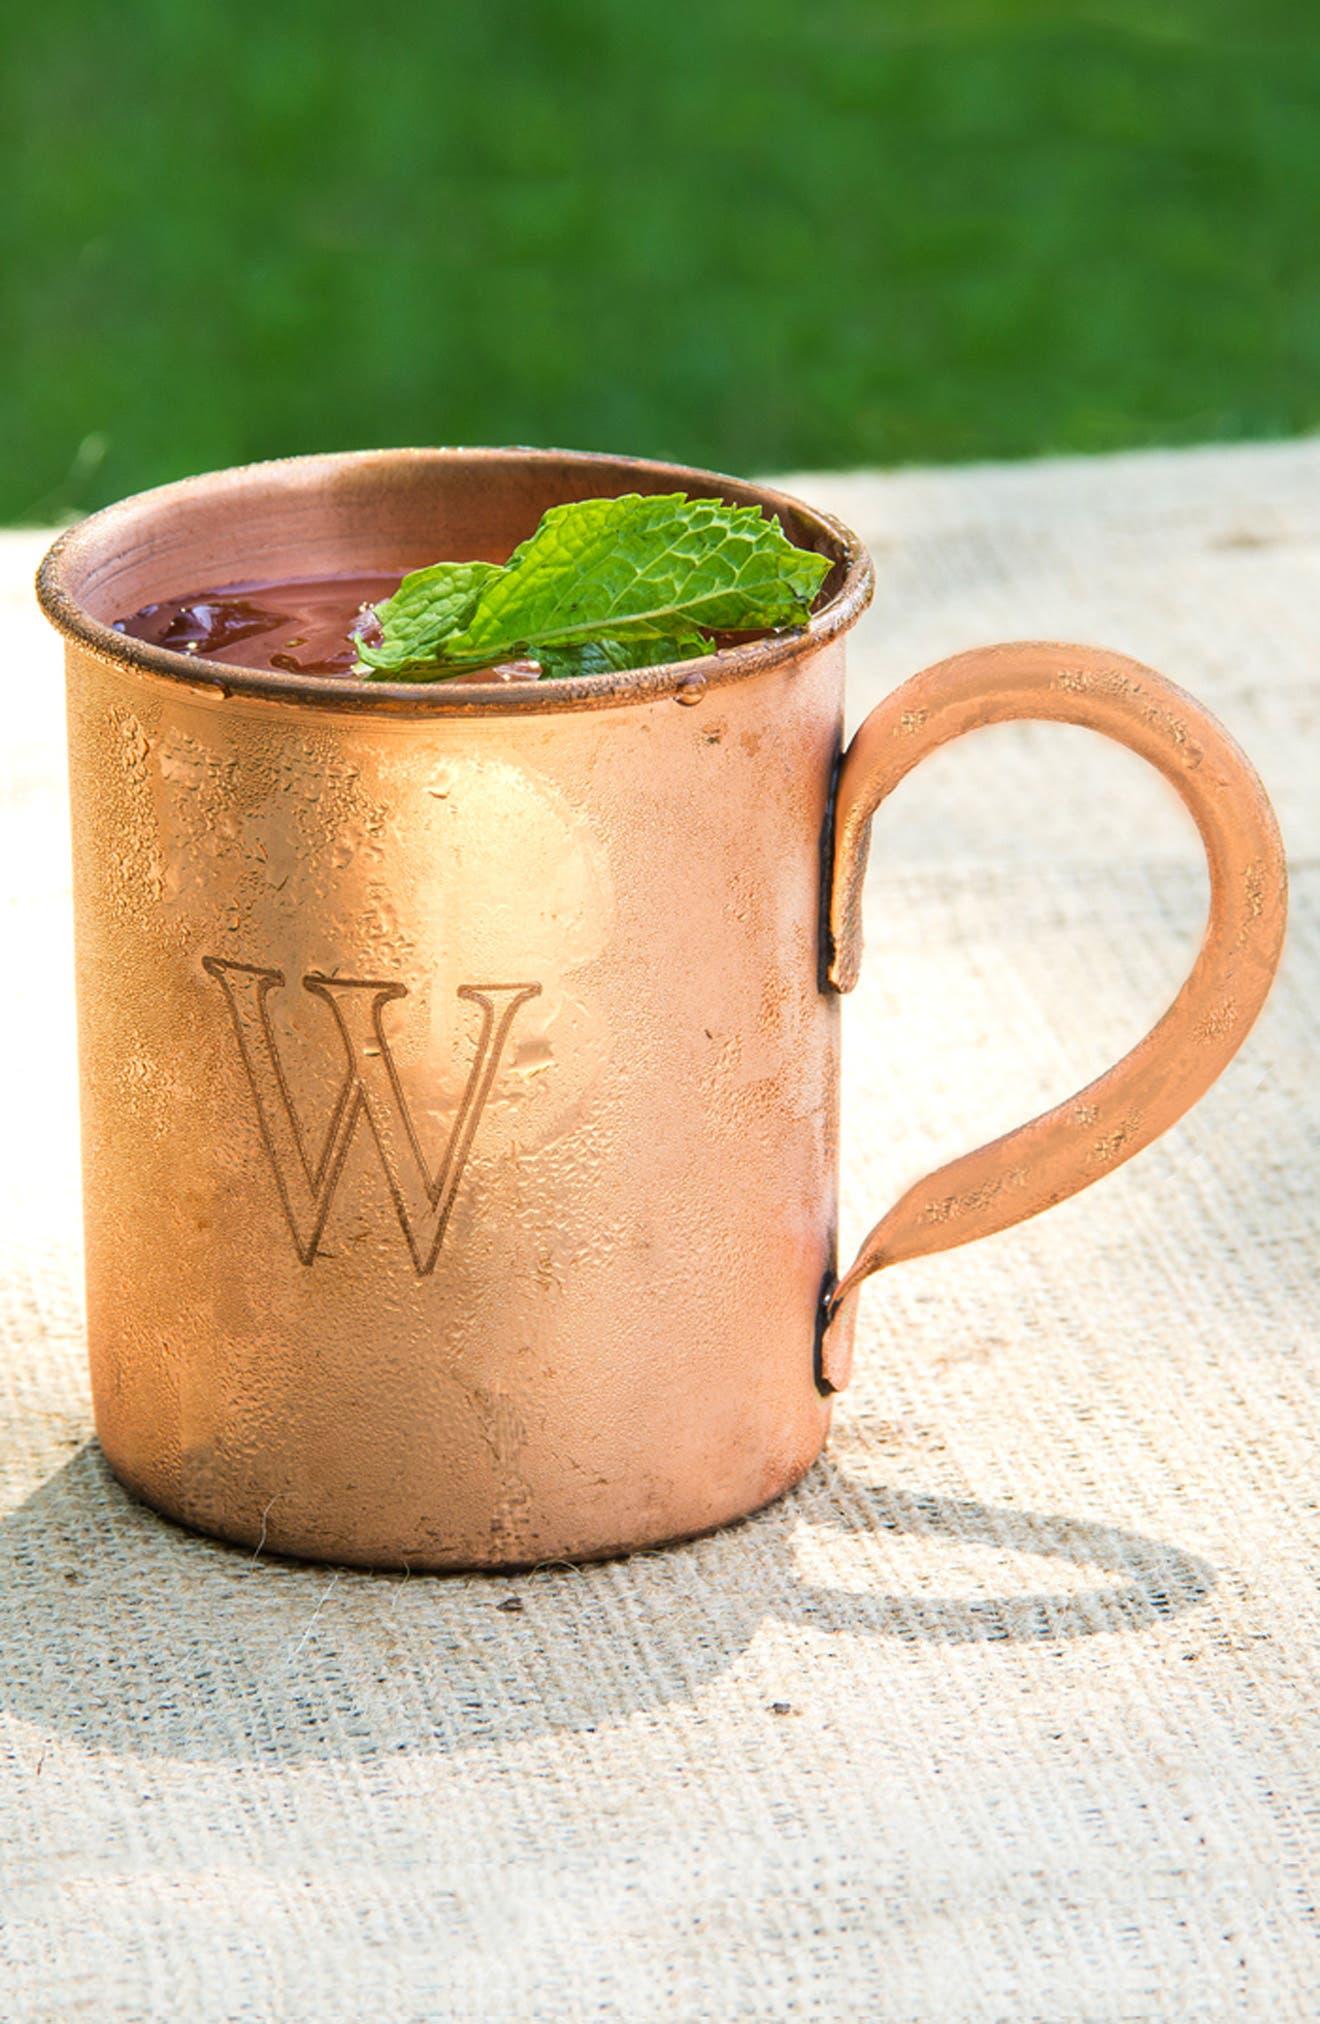 Monogram Moscow Mule Copper Mug,                             Alternate thumbnail 3, color,                             243